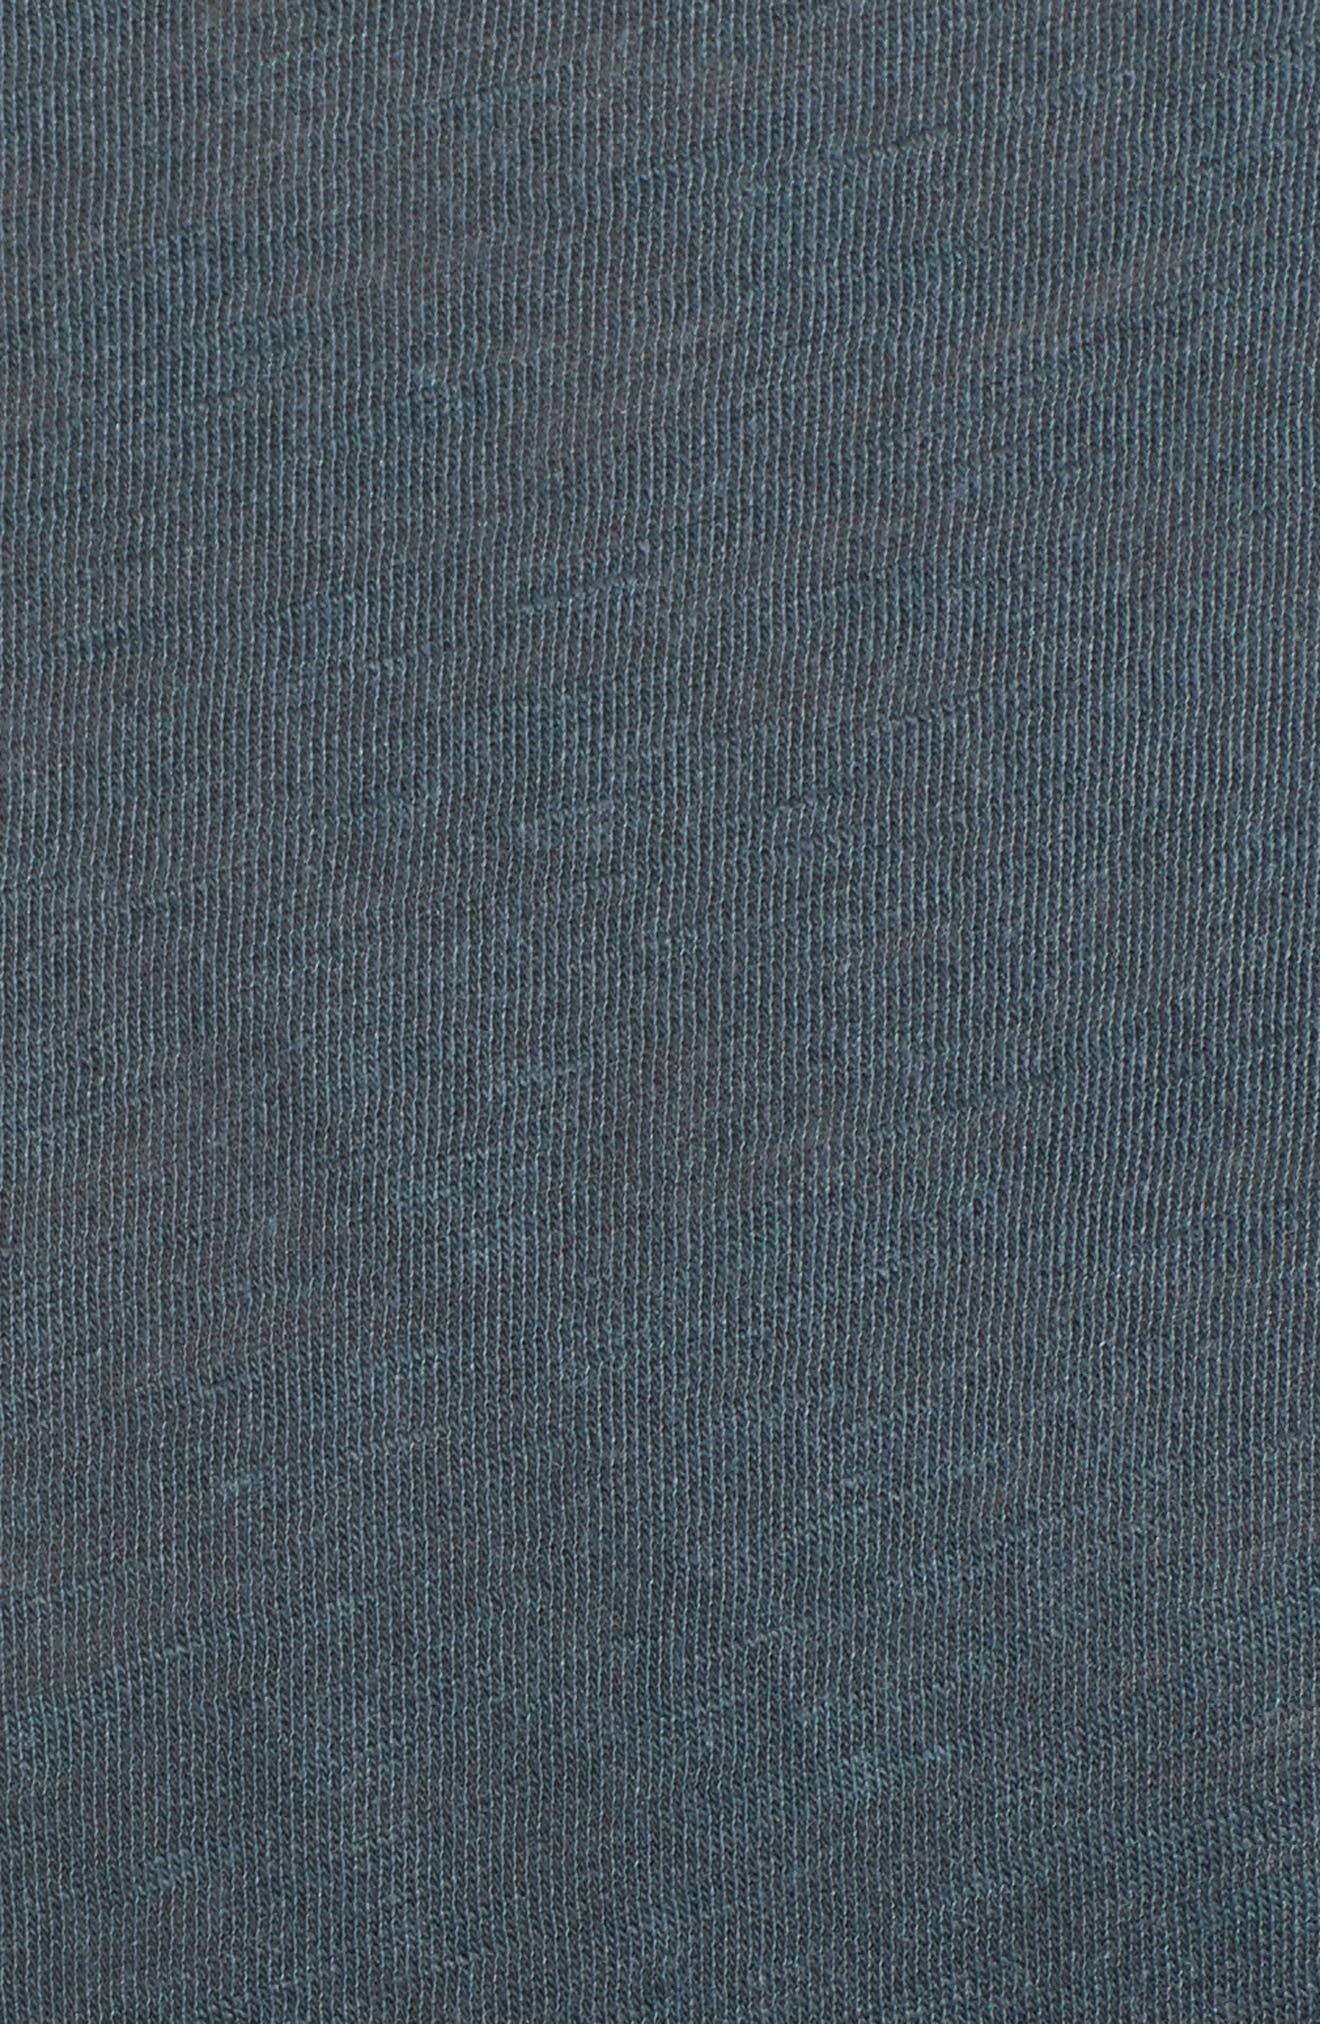 Pleat T-Shirt Dress,                             Alternate thumbnail 5, color,                             Pine